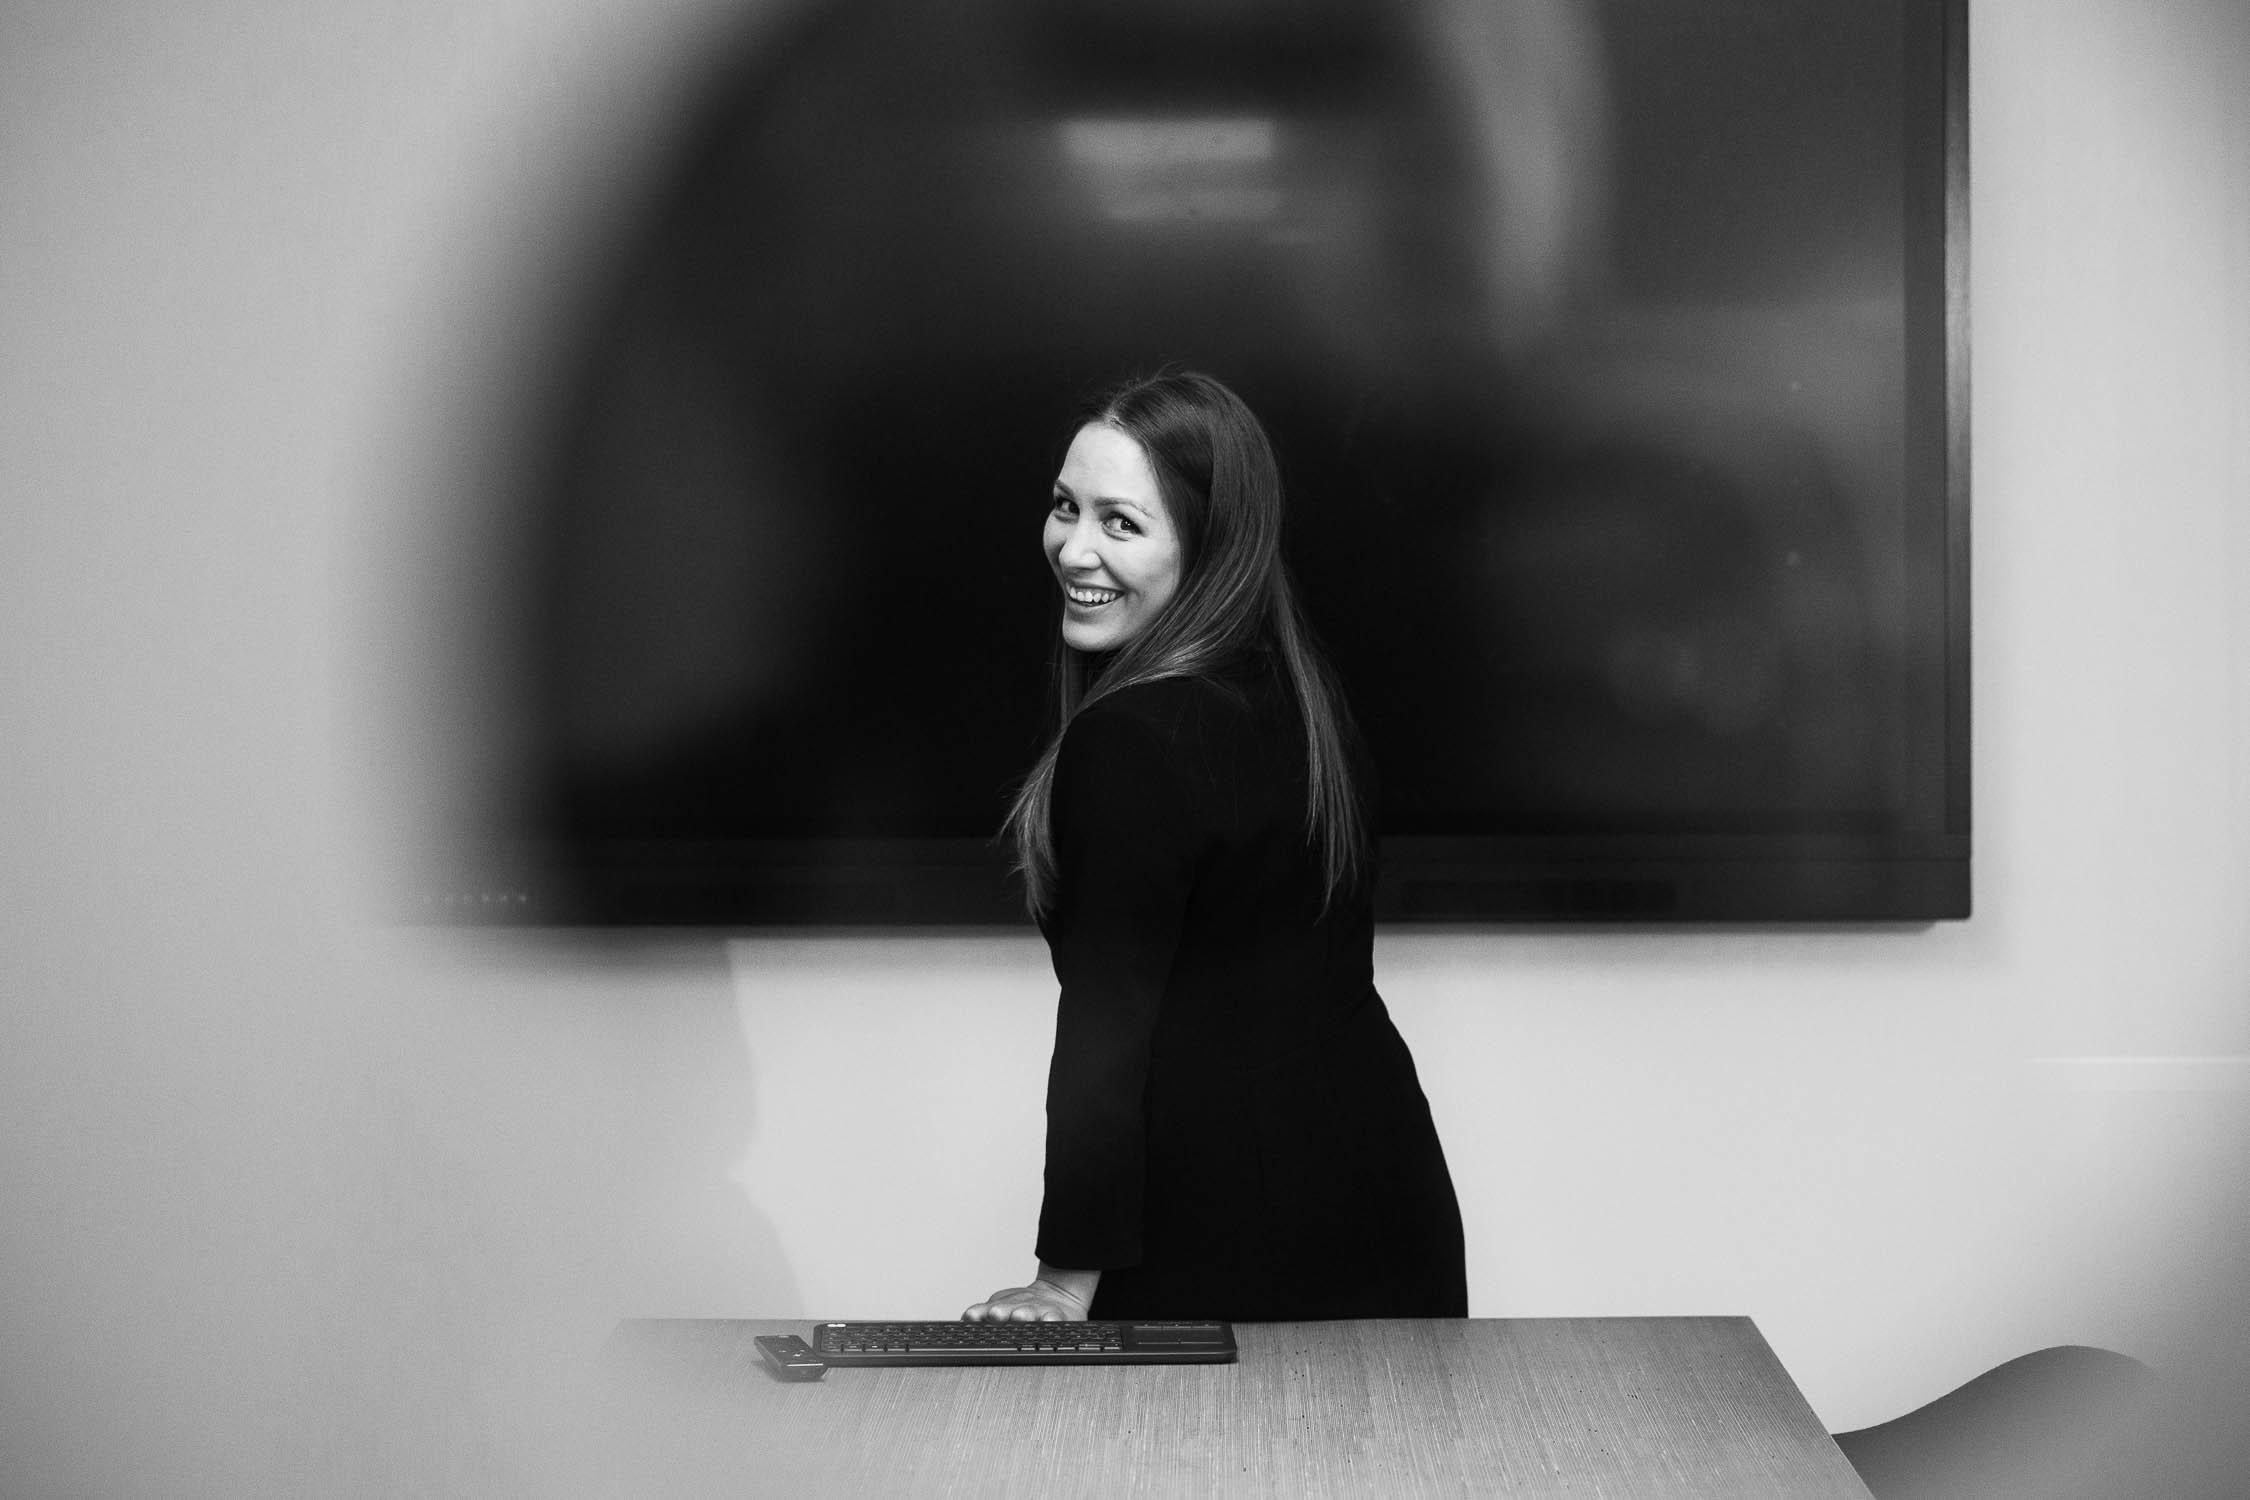 Businessfotos-Berlin-Managerportrait-Fotostudio-Imagefoto-Annette-Koroll